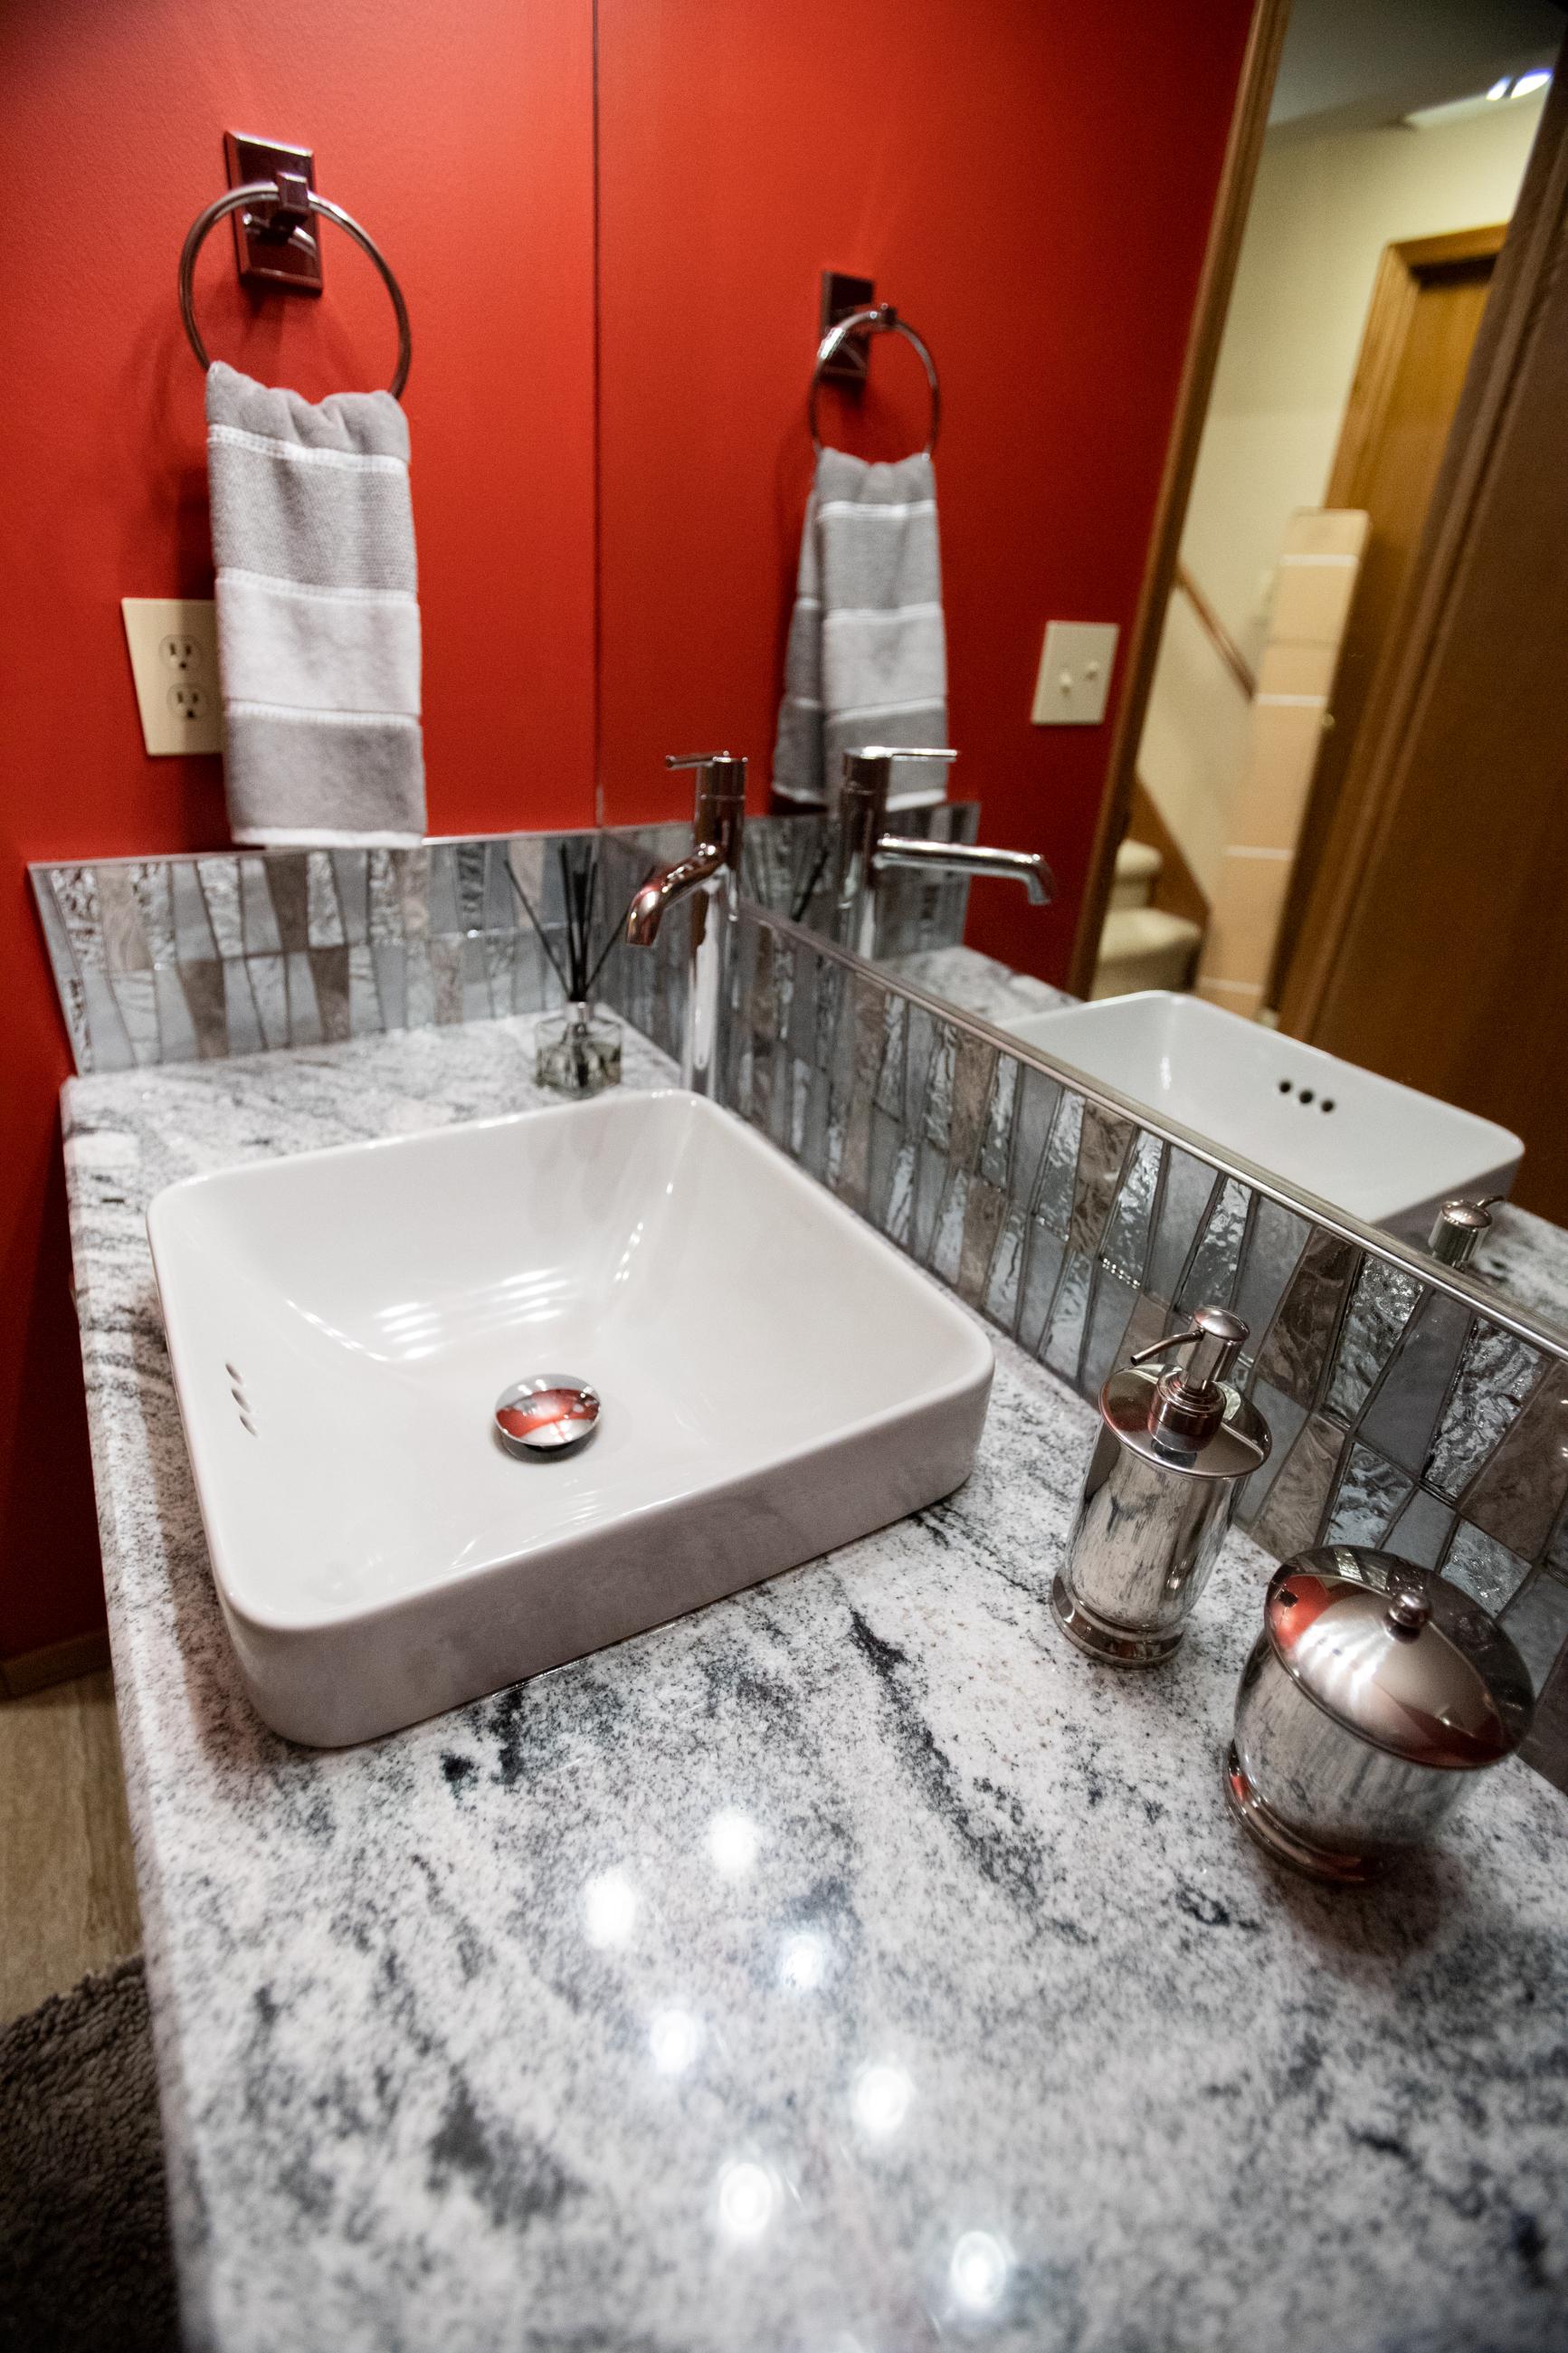 new countertop, sink and backsplash